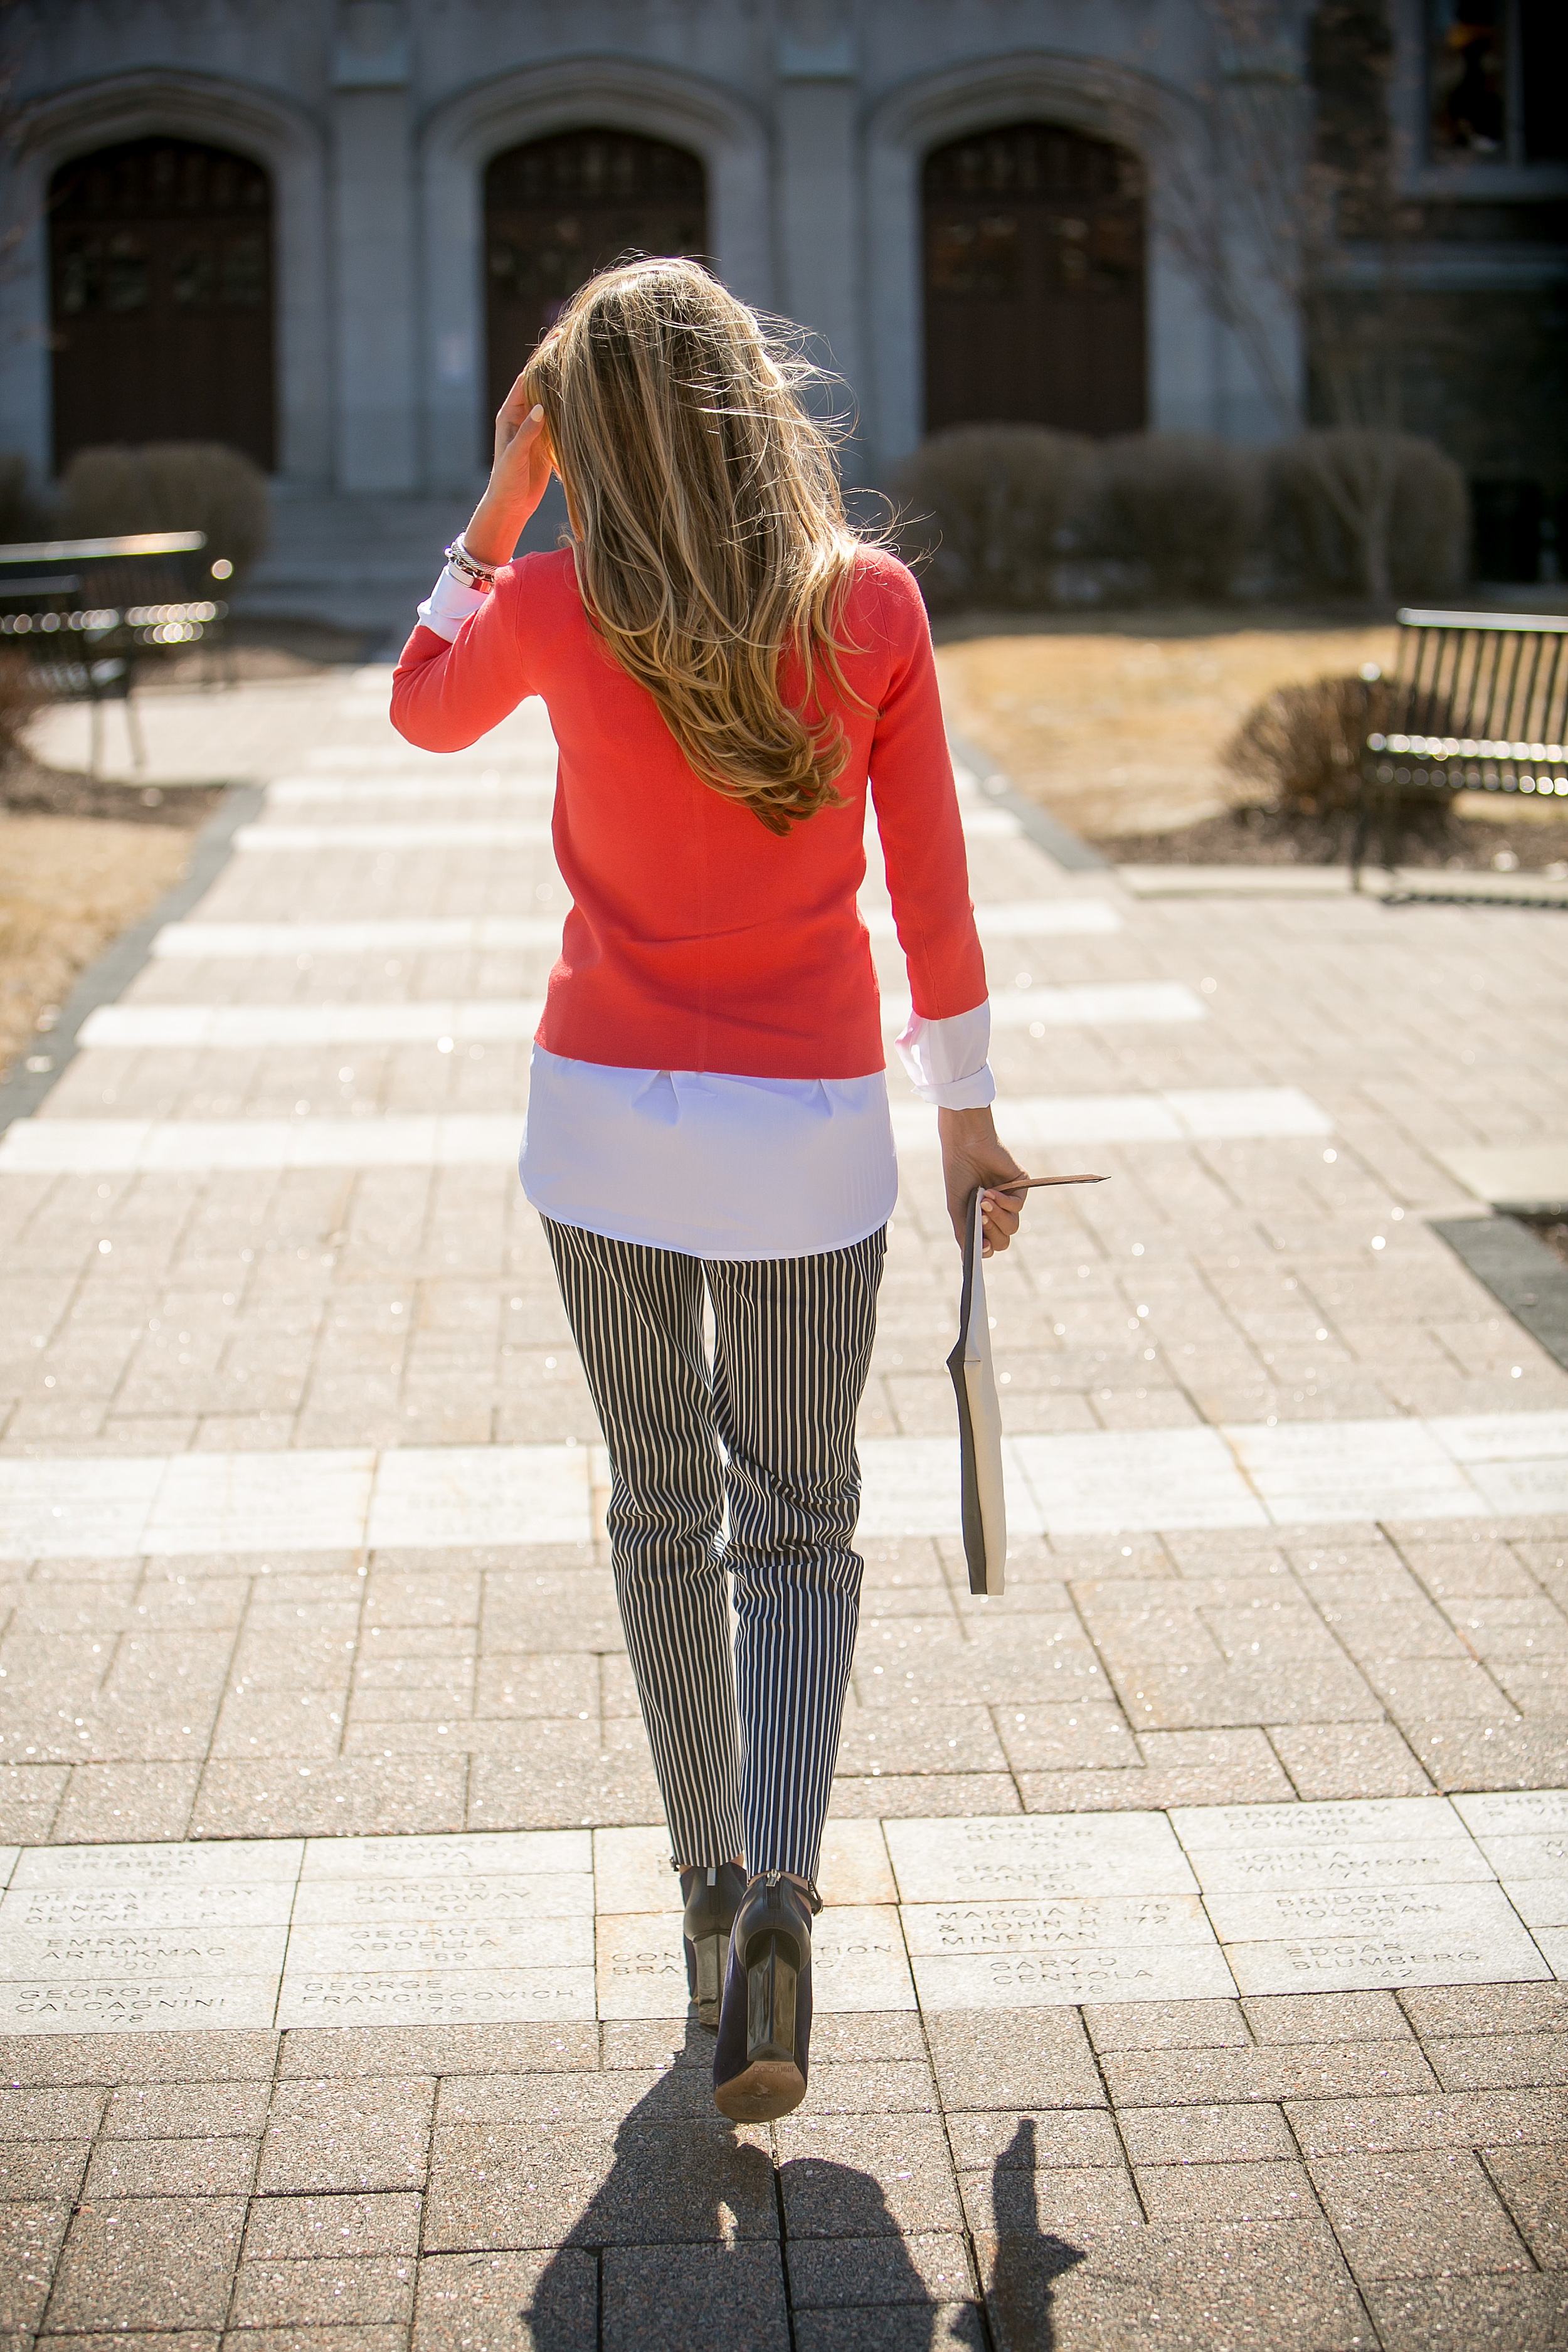 Pants:   Ann Taylor  | Sweater:   Ann Taylor  | Booties:   Jimmy Choo  | Pouch:   Banana Republic